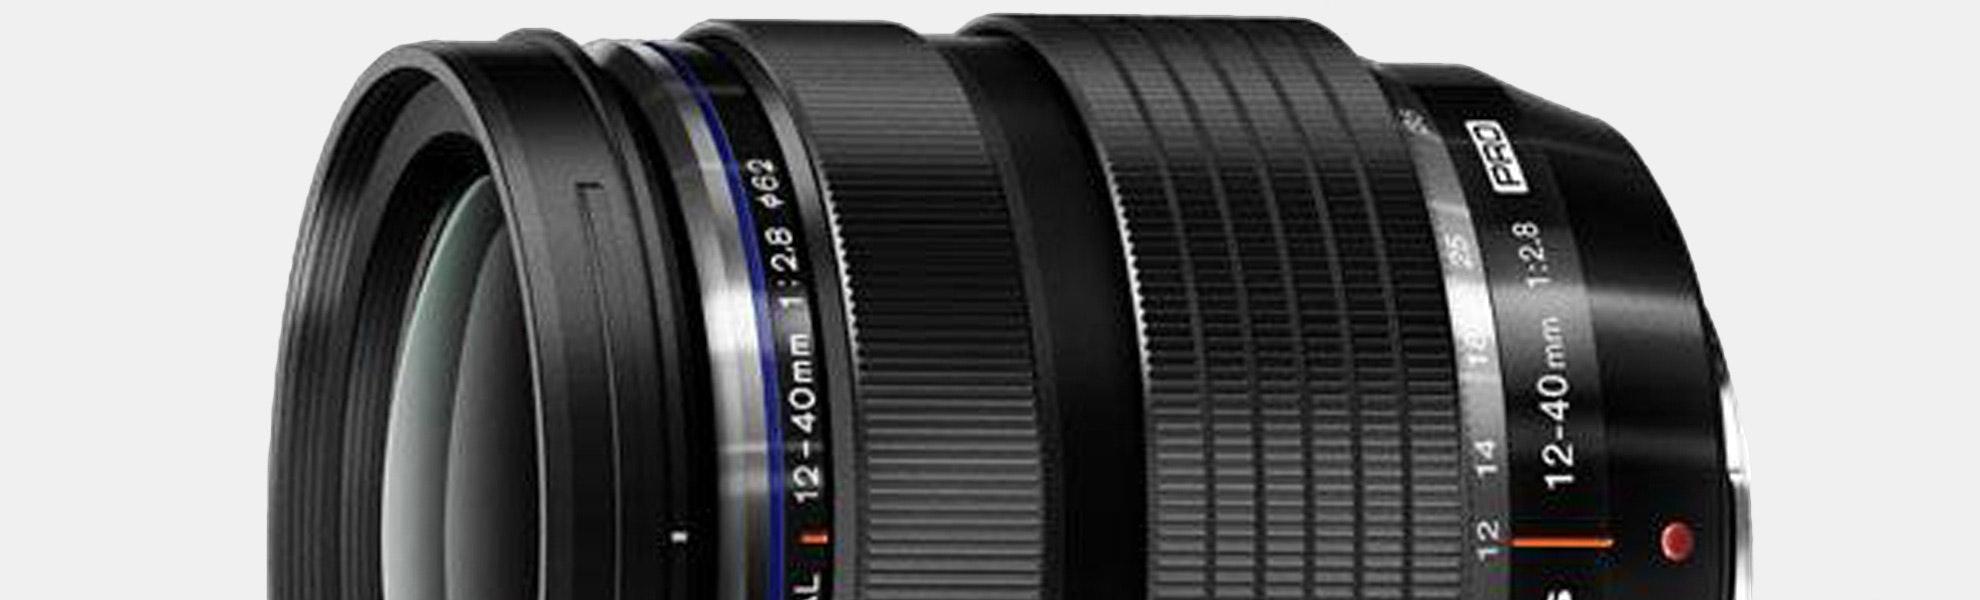 Olympus M. Zuiko ED 12-40mm f/2.8 Pro Lens